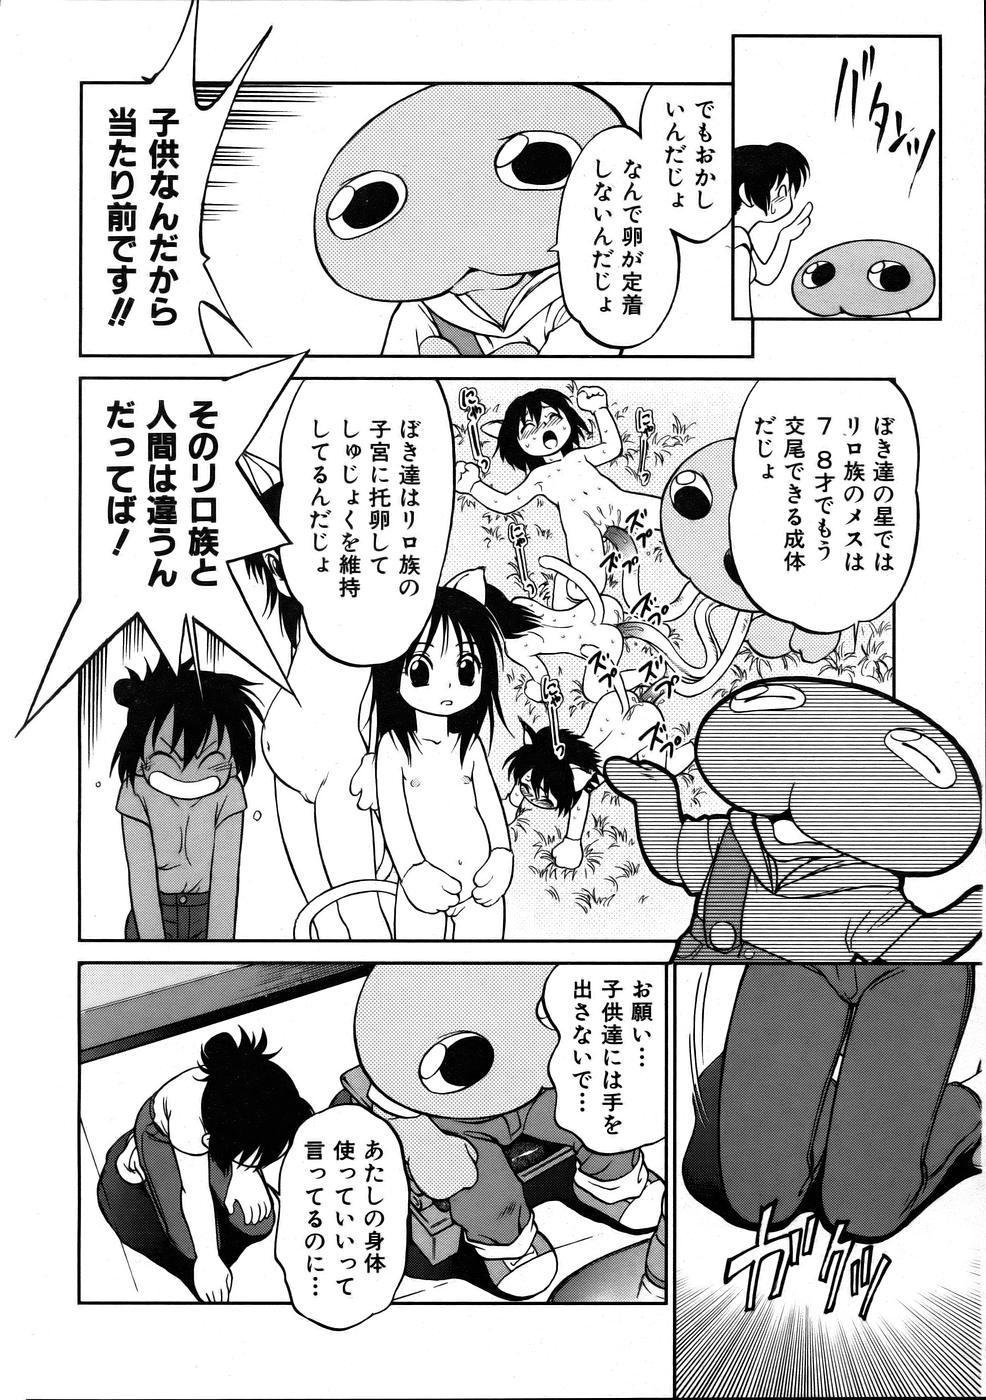 COMIC AUN 2005-10 Vol. 113 121